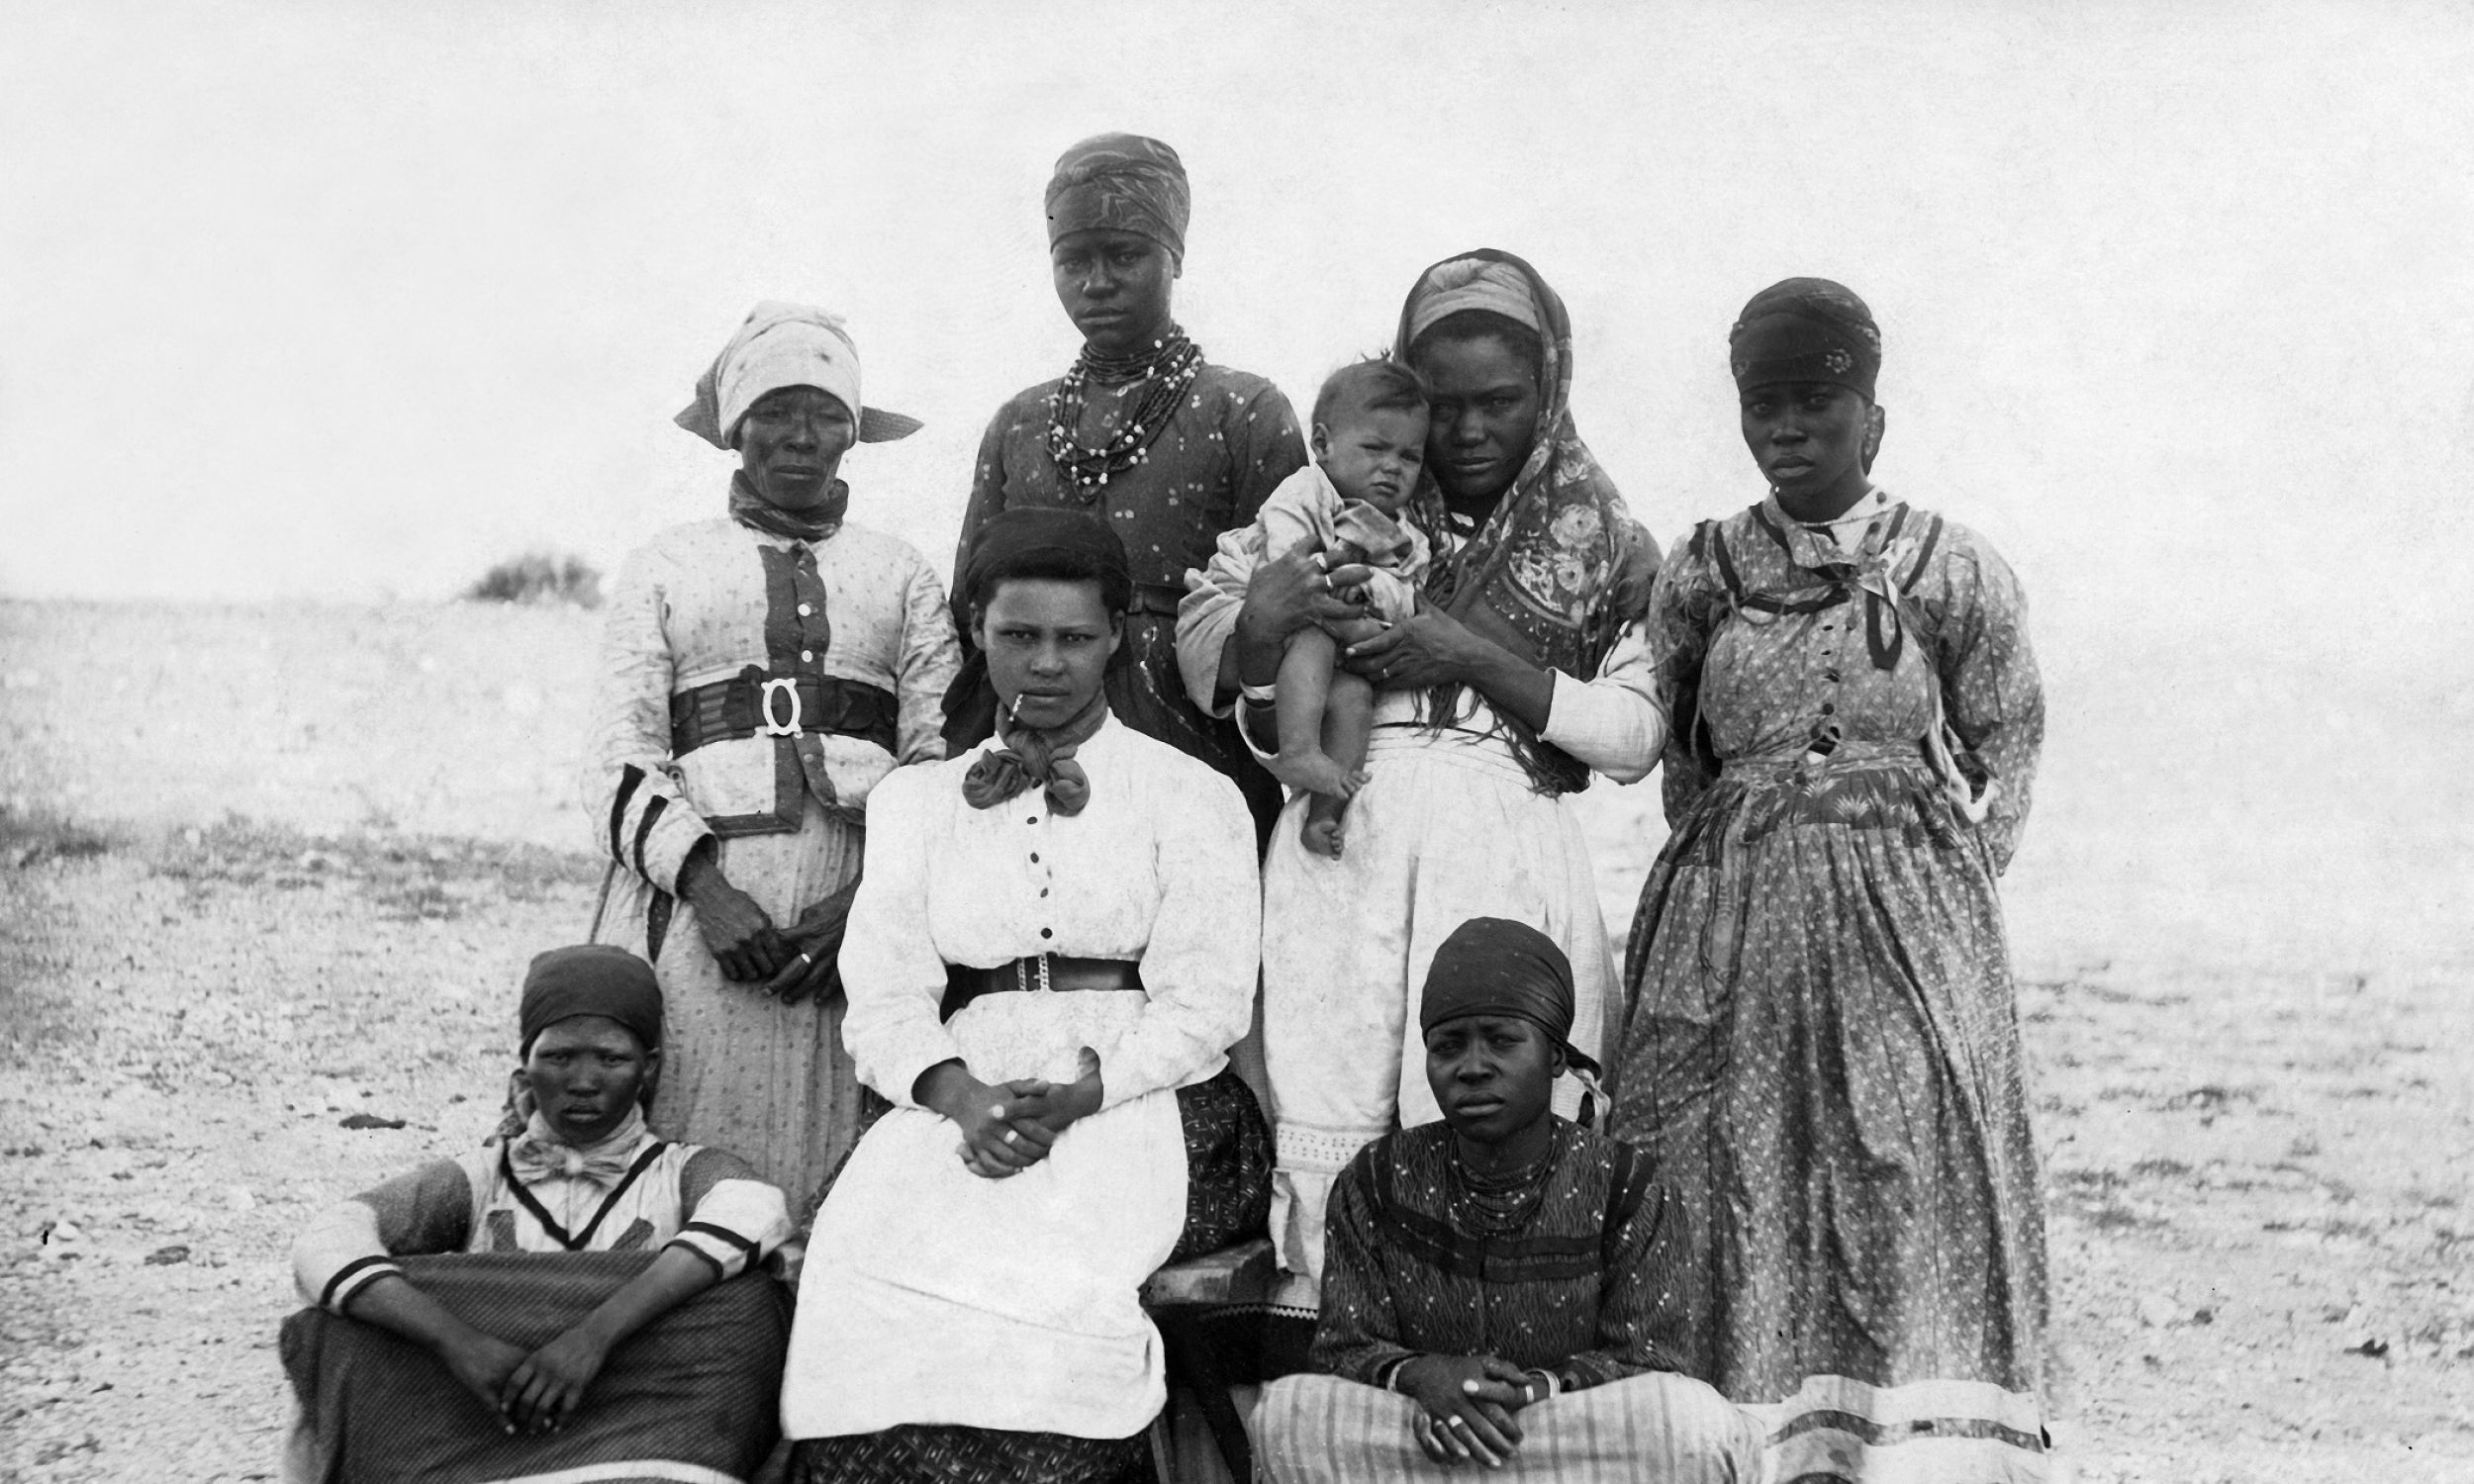 Rok 1904. Grupa kobiet Herero w zachodnich ubraniach. Fot. Ullstein bild / ullstein bild via Getty Images